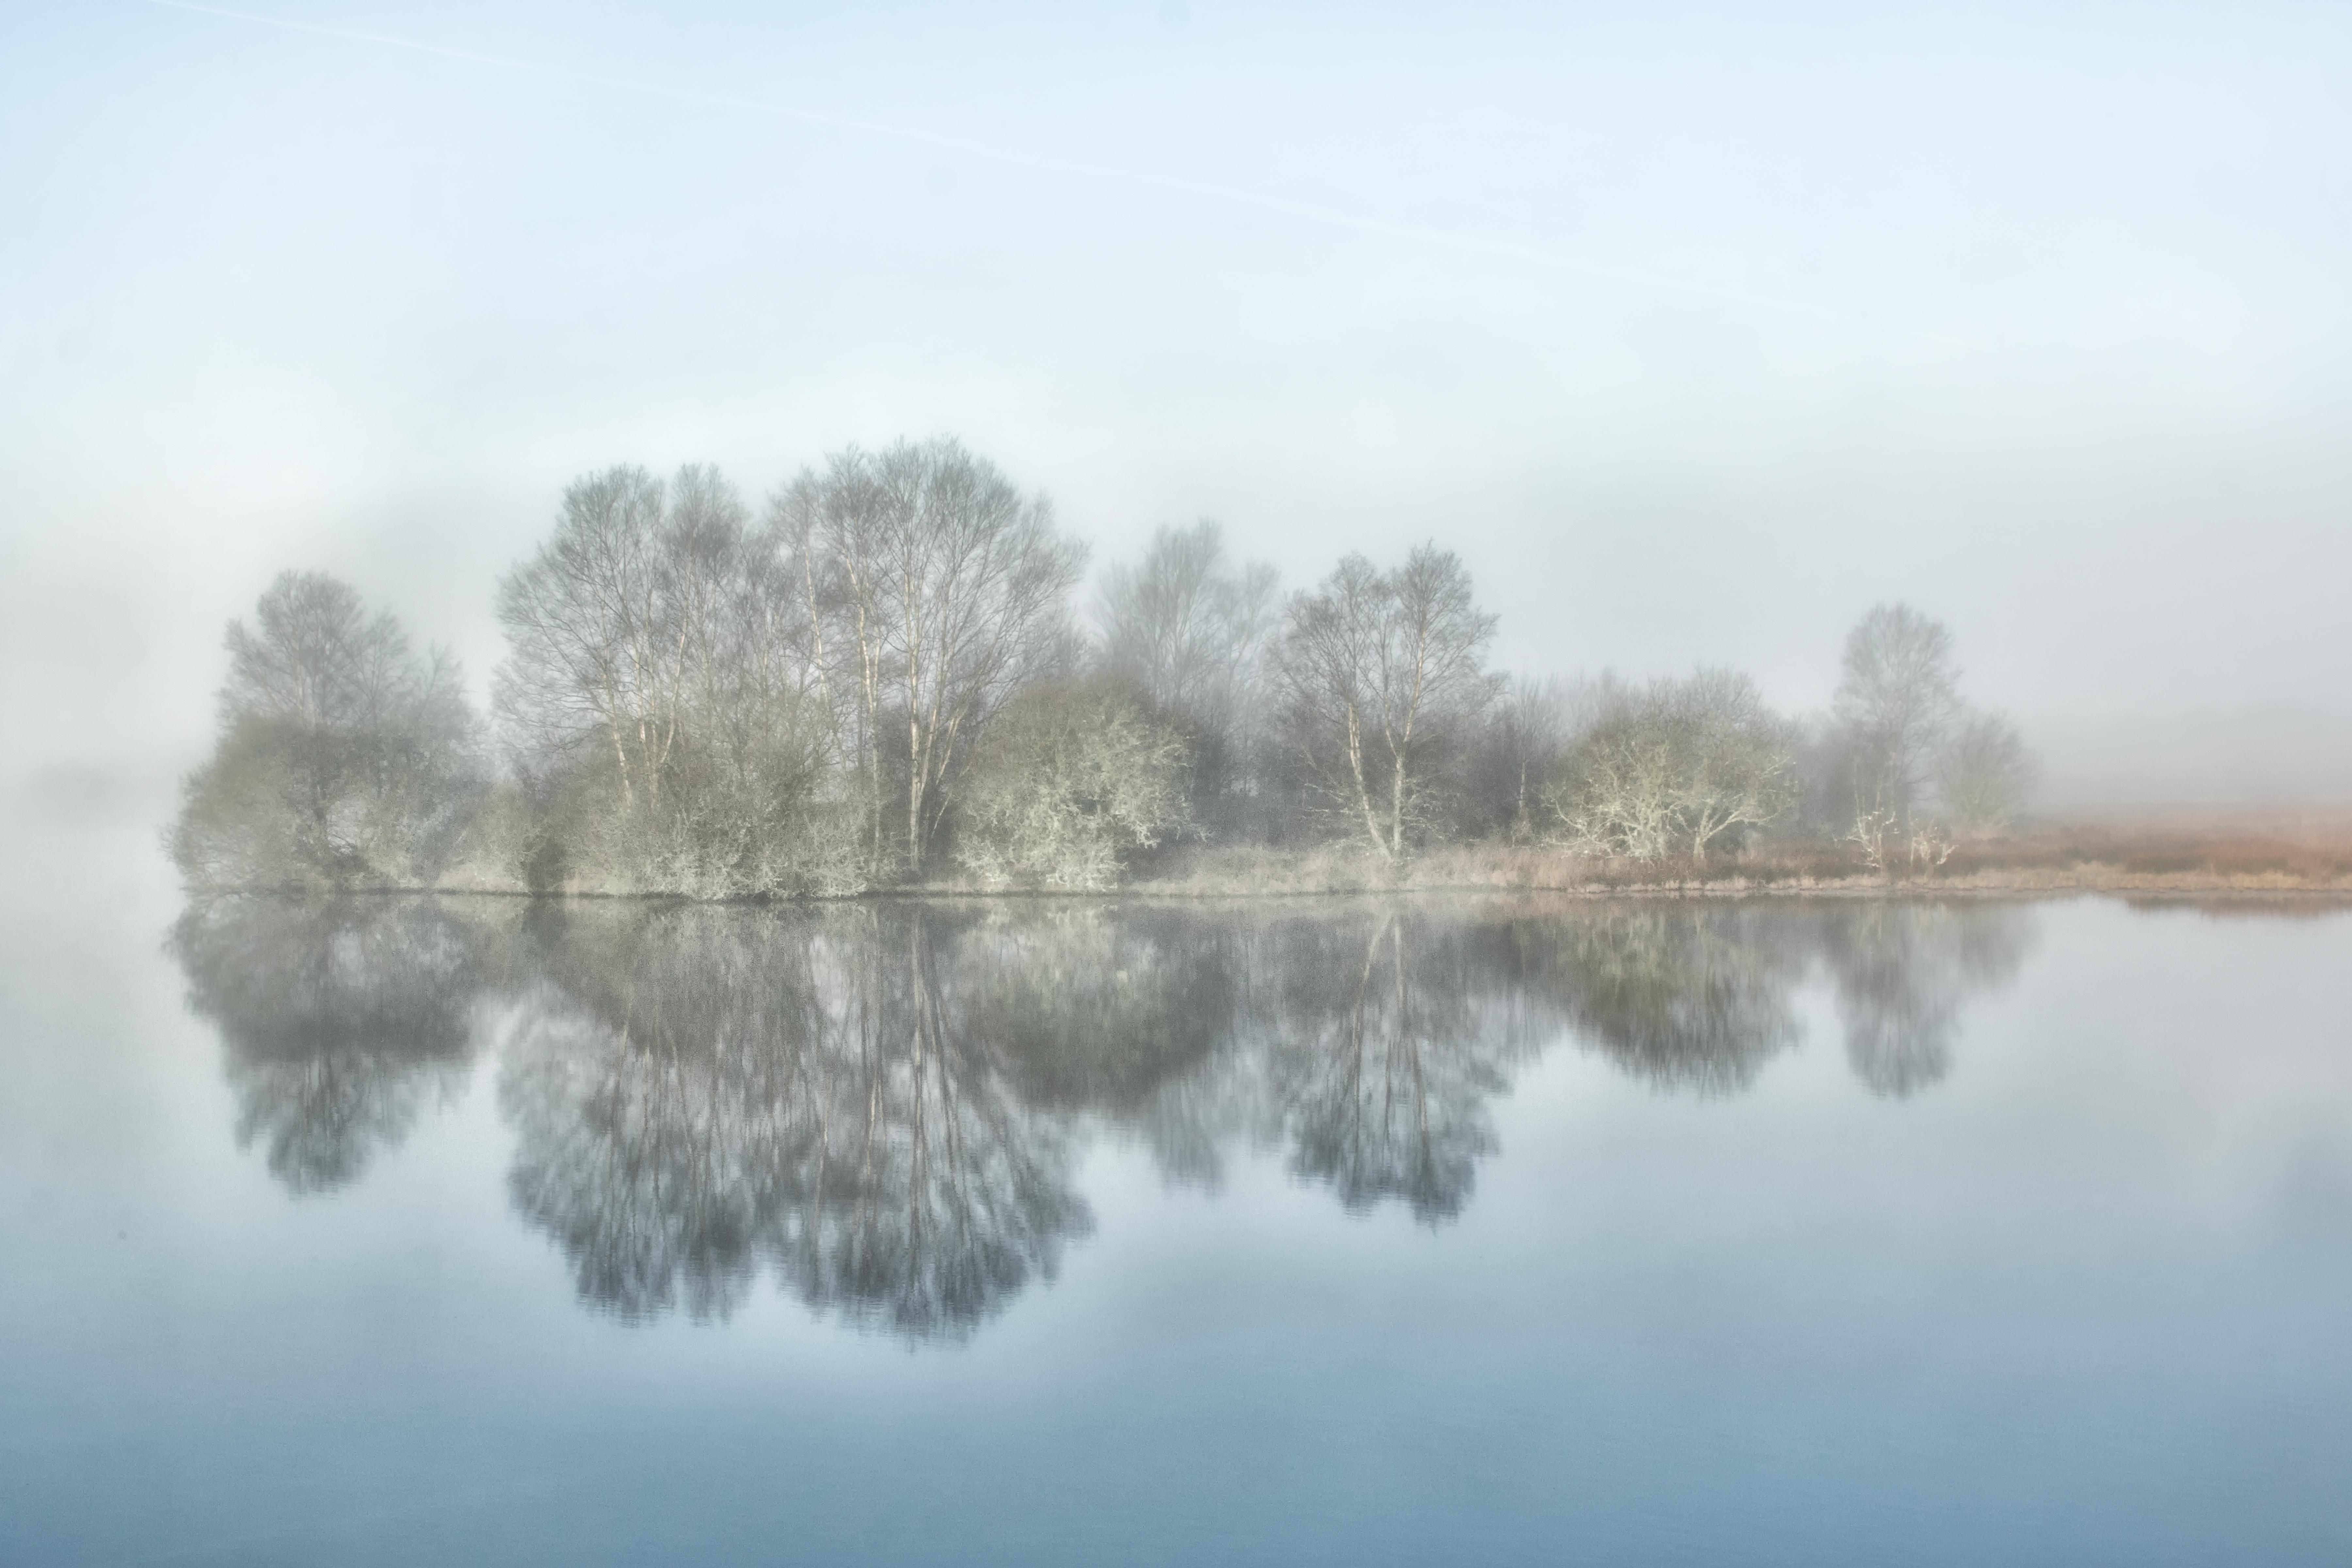 Misty Vartry morning